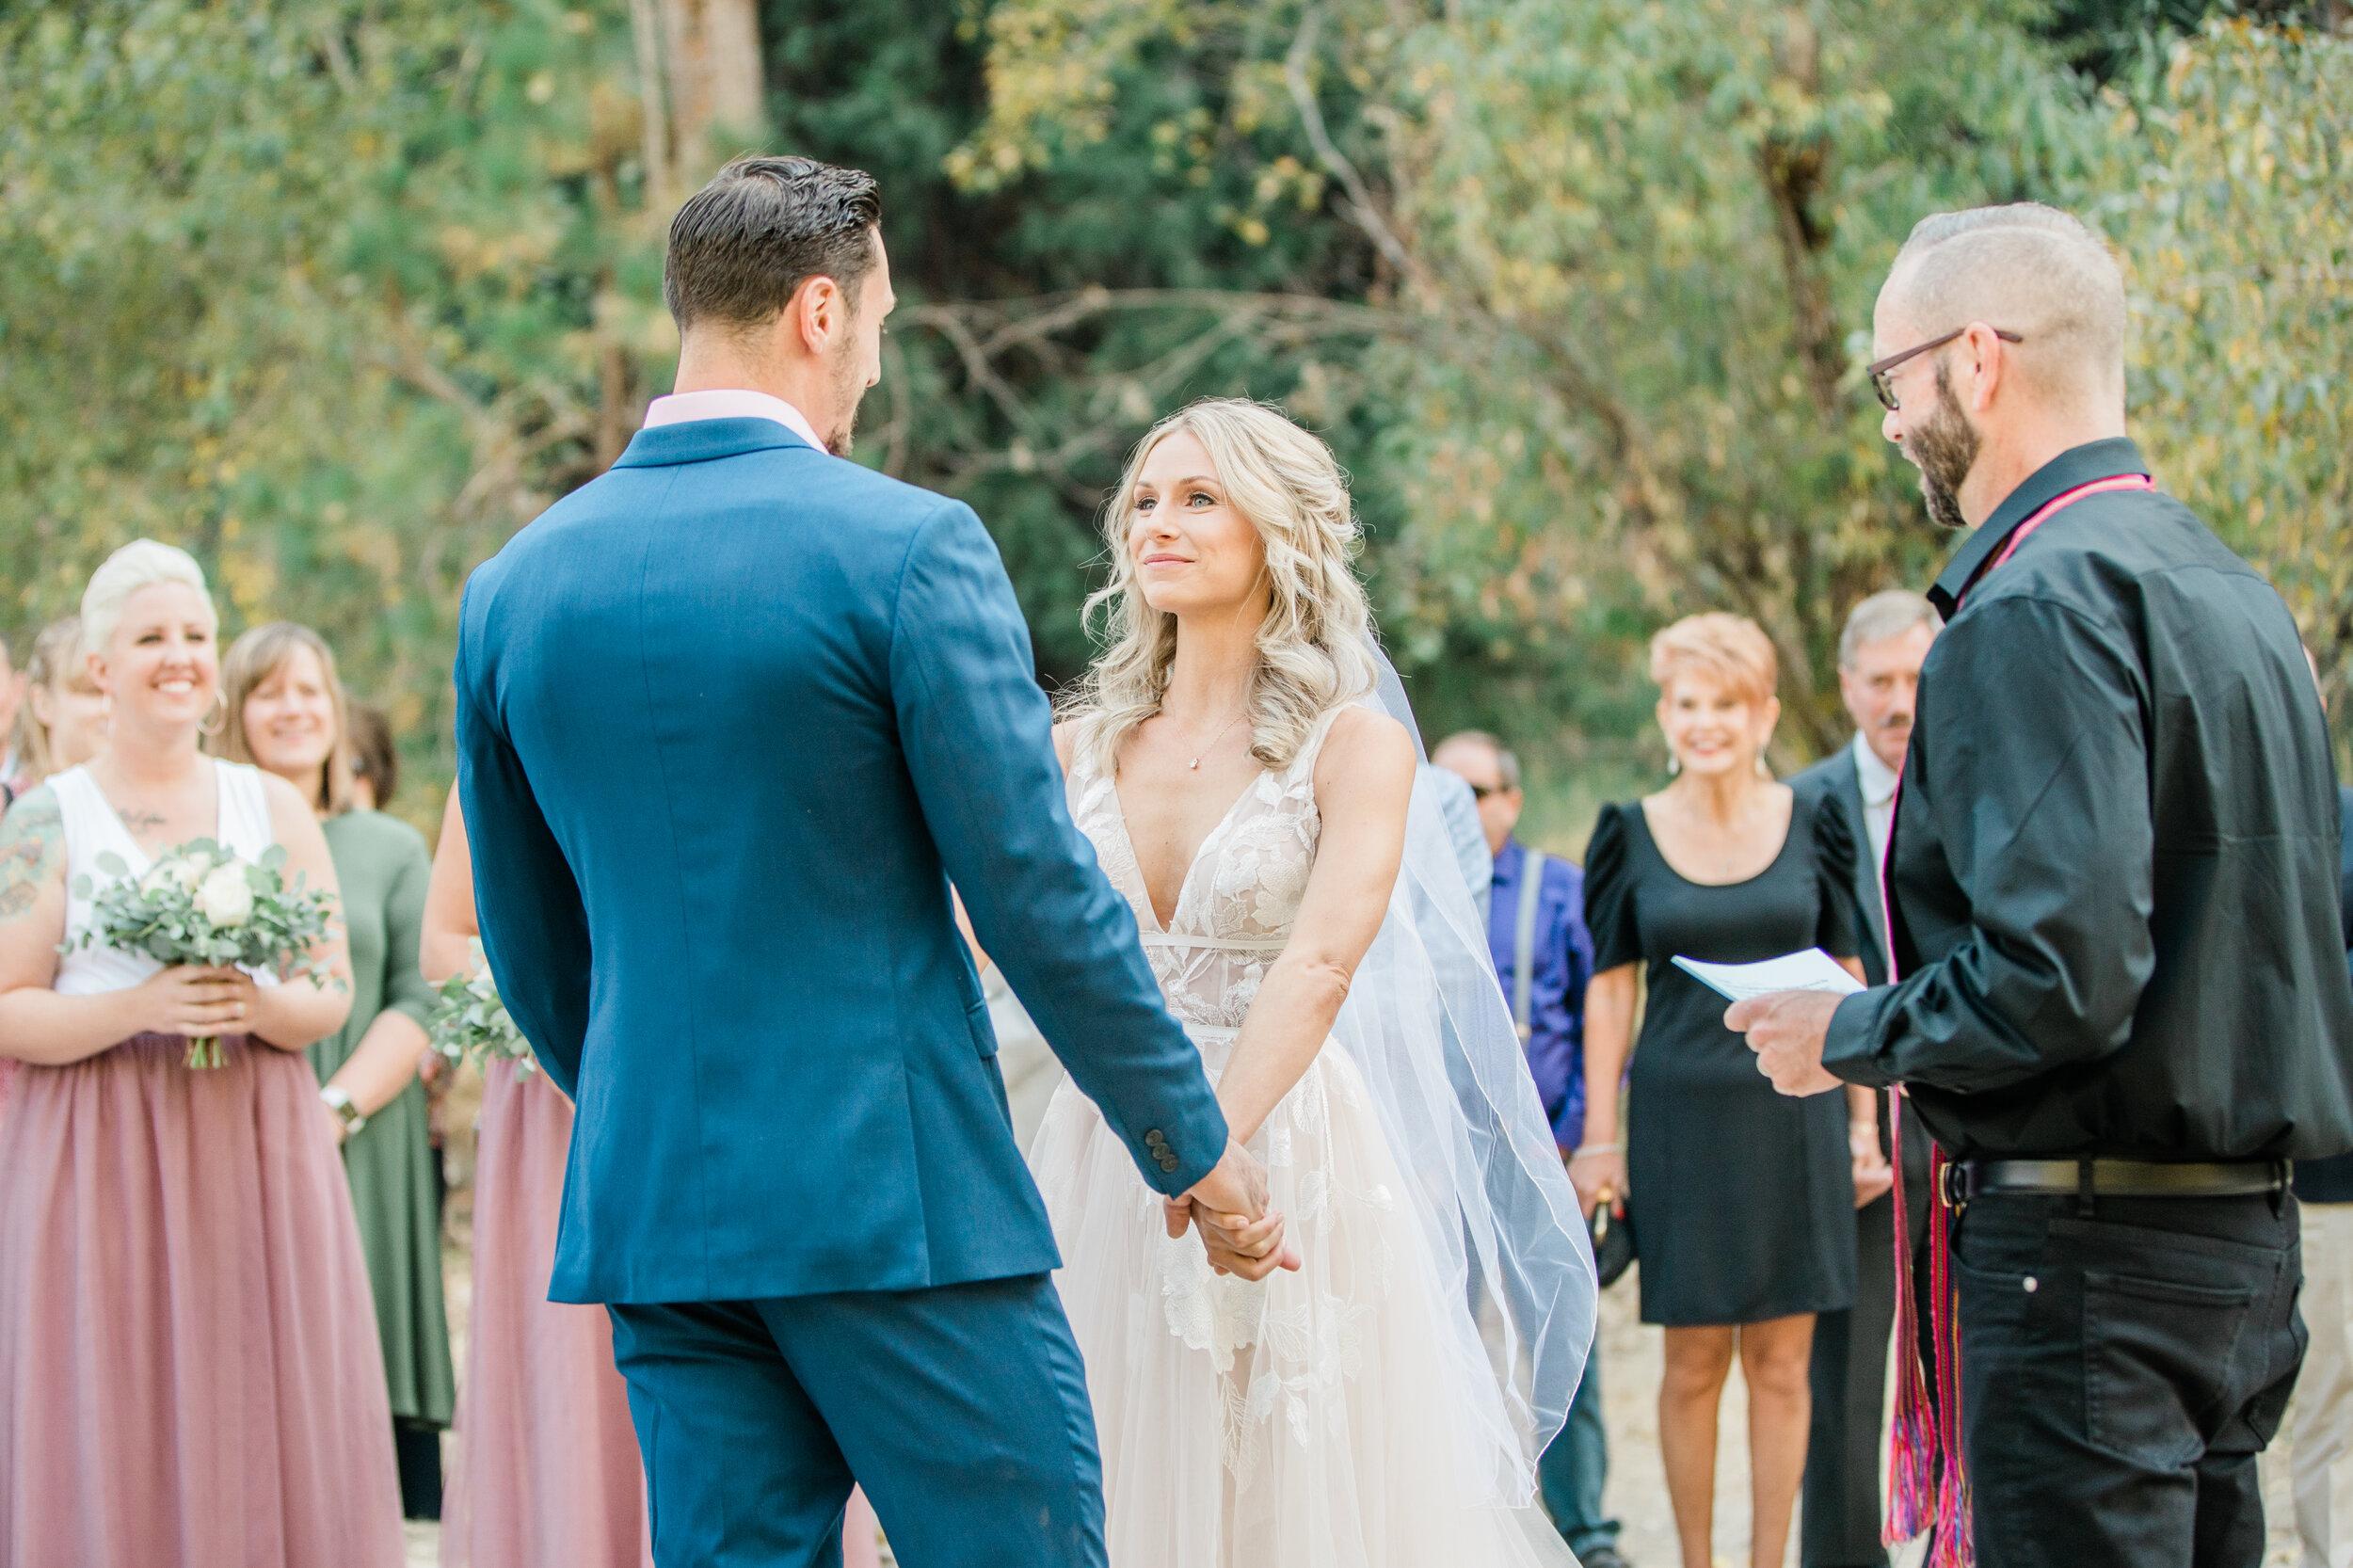 Leanne and Joe - Married - Sneak Peeks - Lauren Alisse Photography-17.jpg